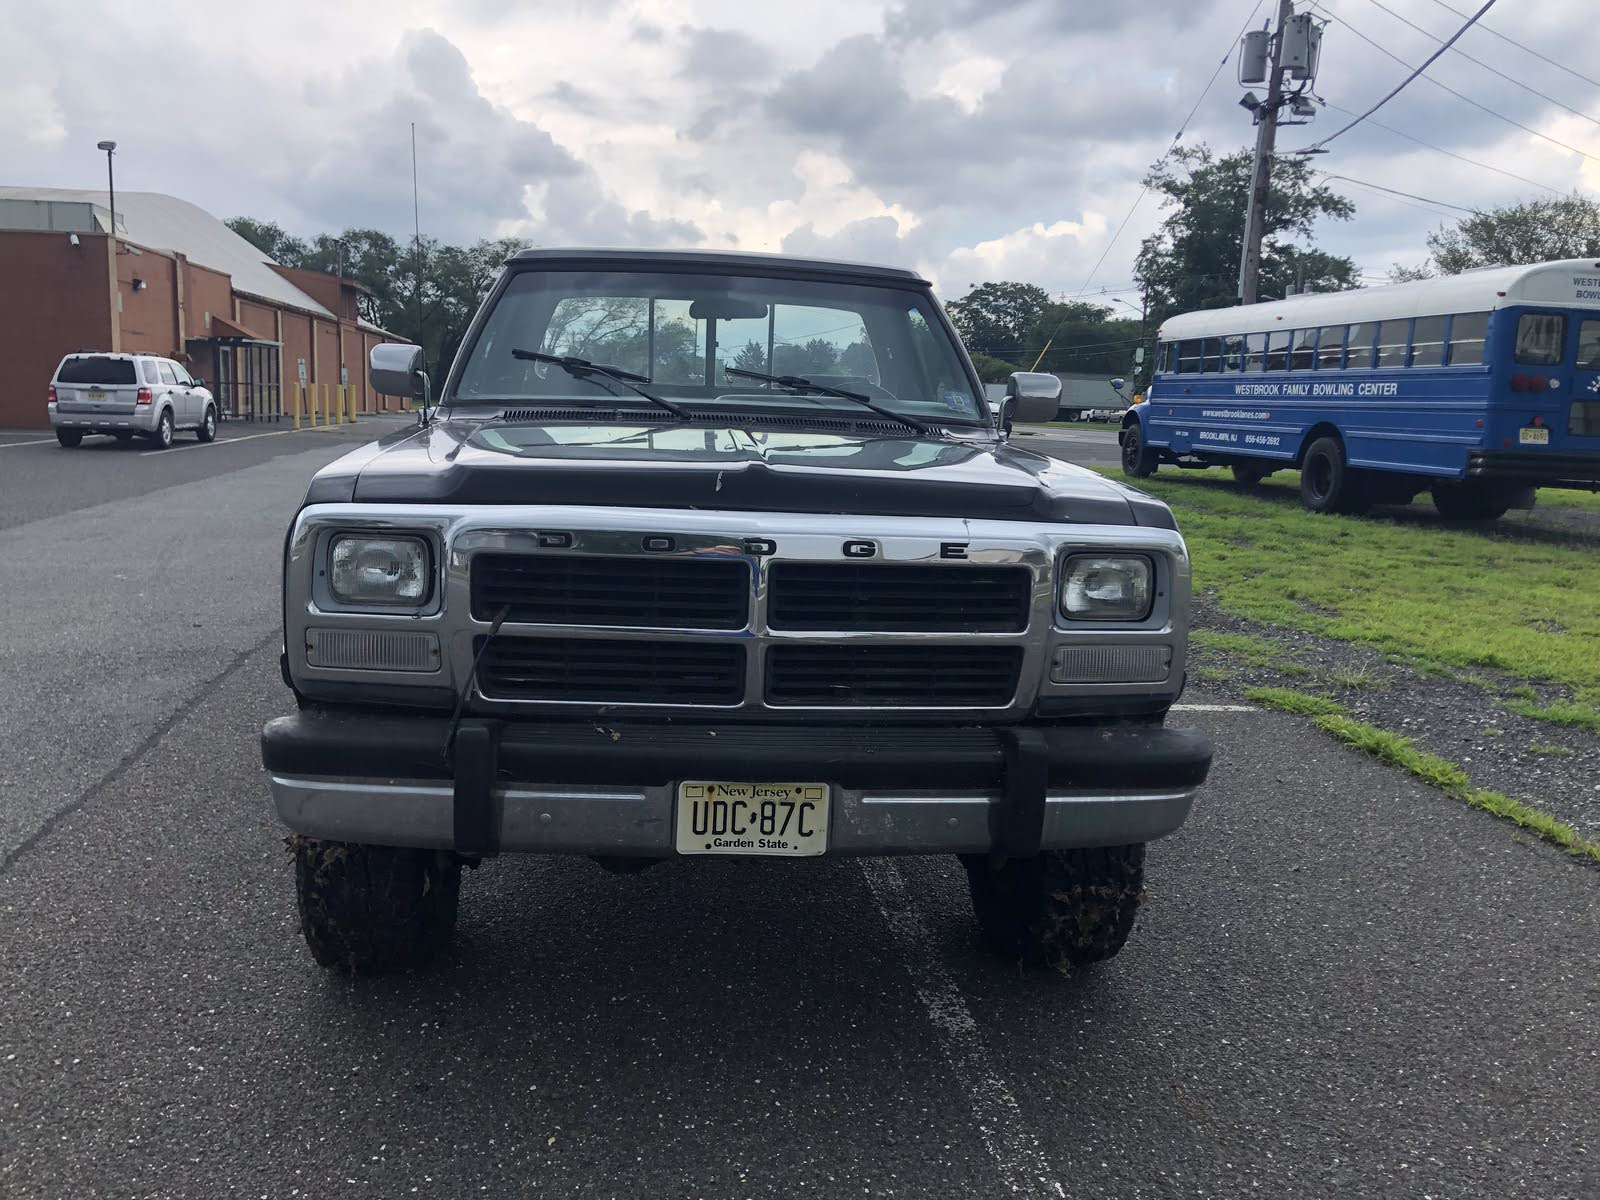 93 Dodge Cummins >> 1993 Dodge Ram 250 Overview Cargurus